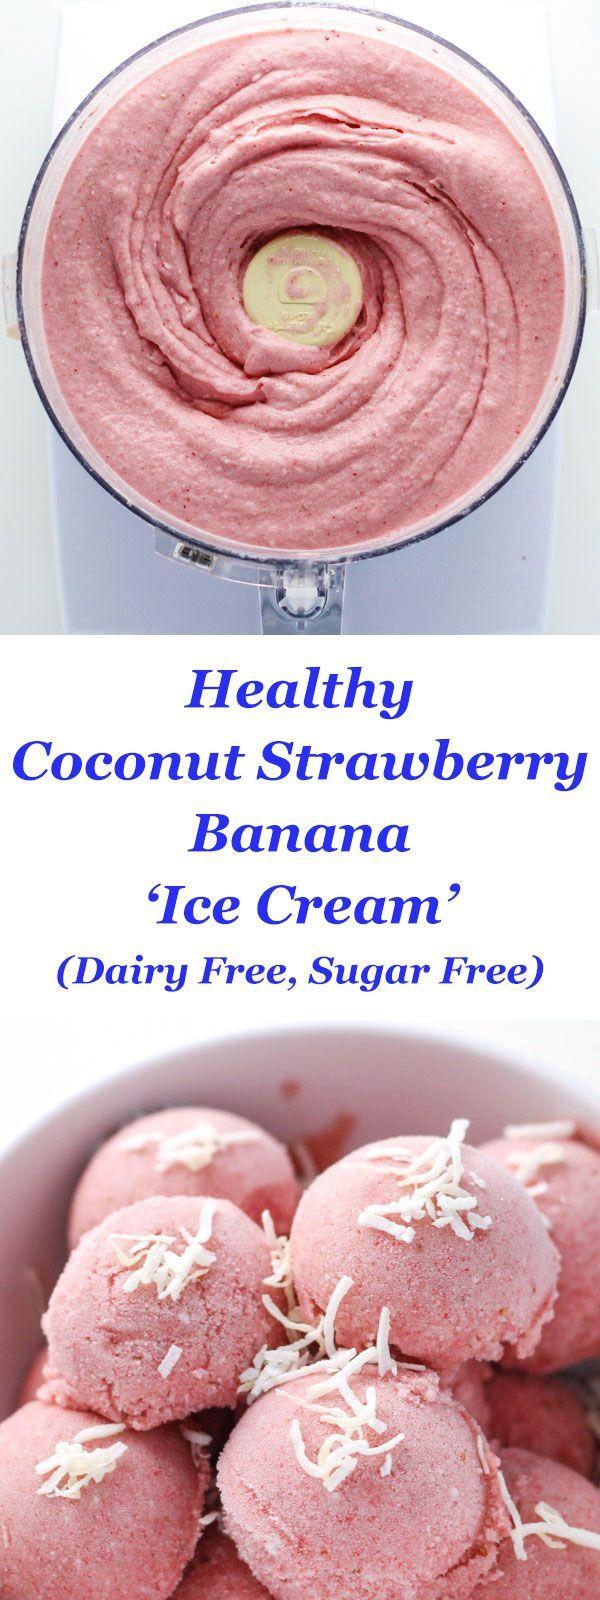 "Healthy Coconut Strawberry Banana ""Ice Cream"" - {Paleo, Vegan, Gluten-Free}"